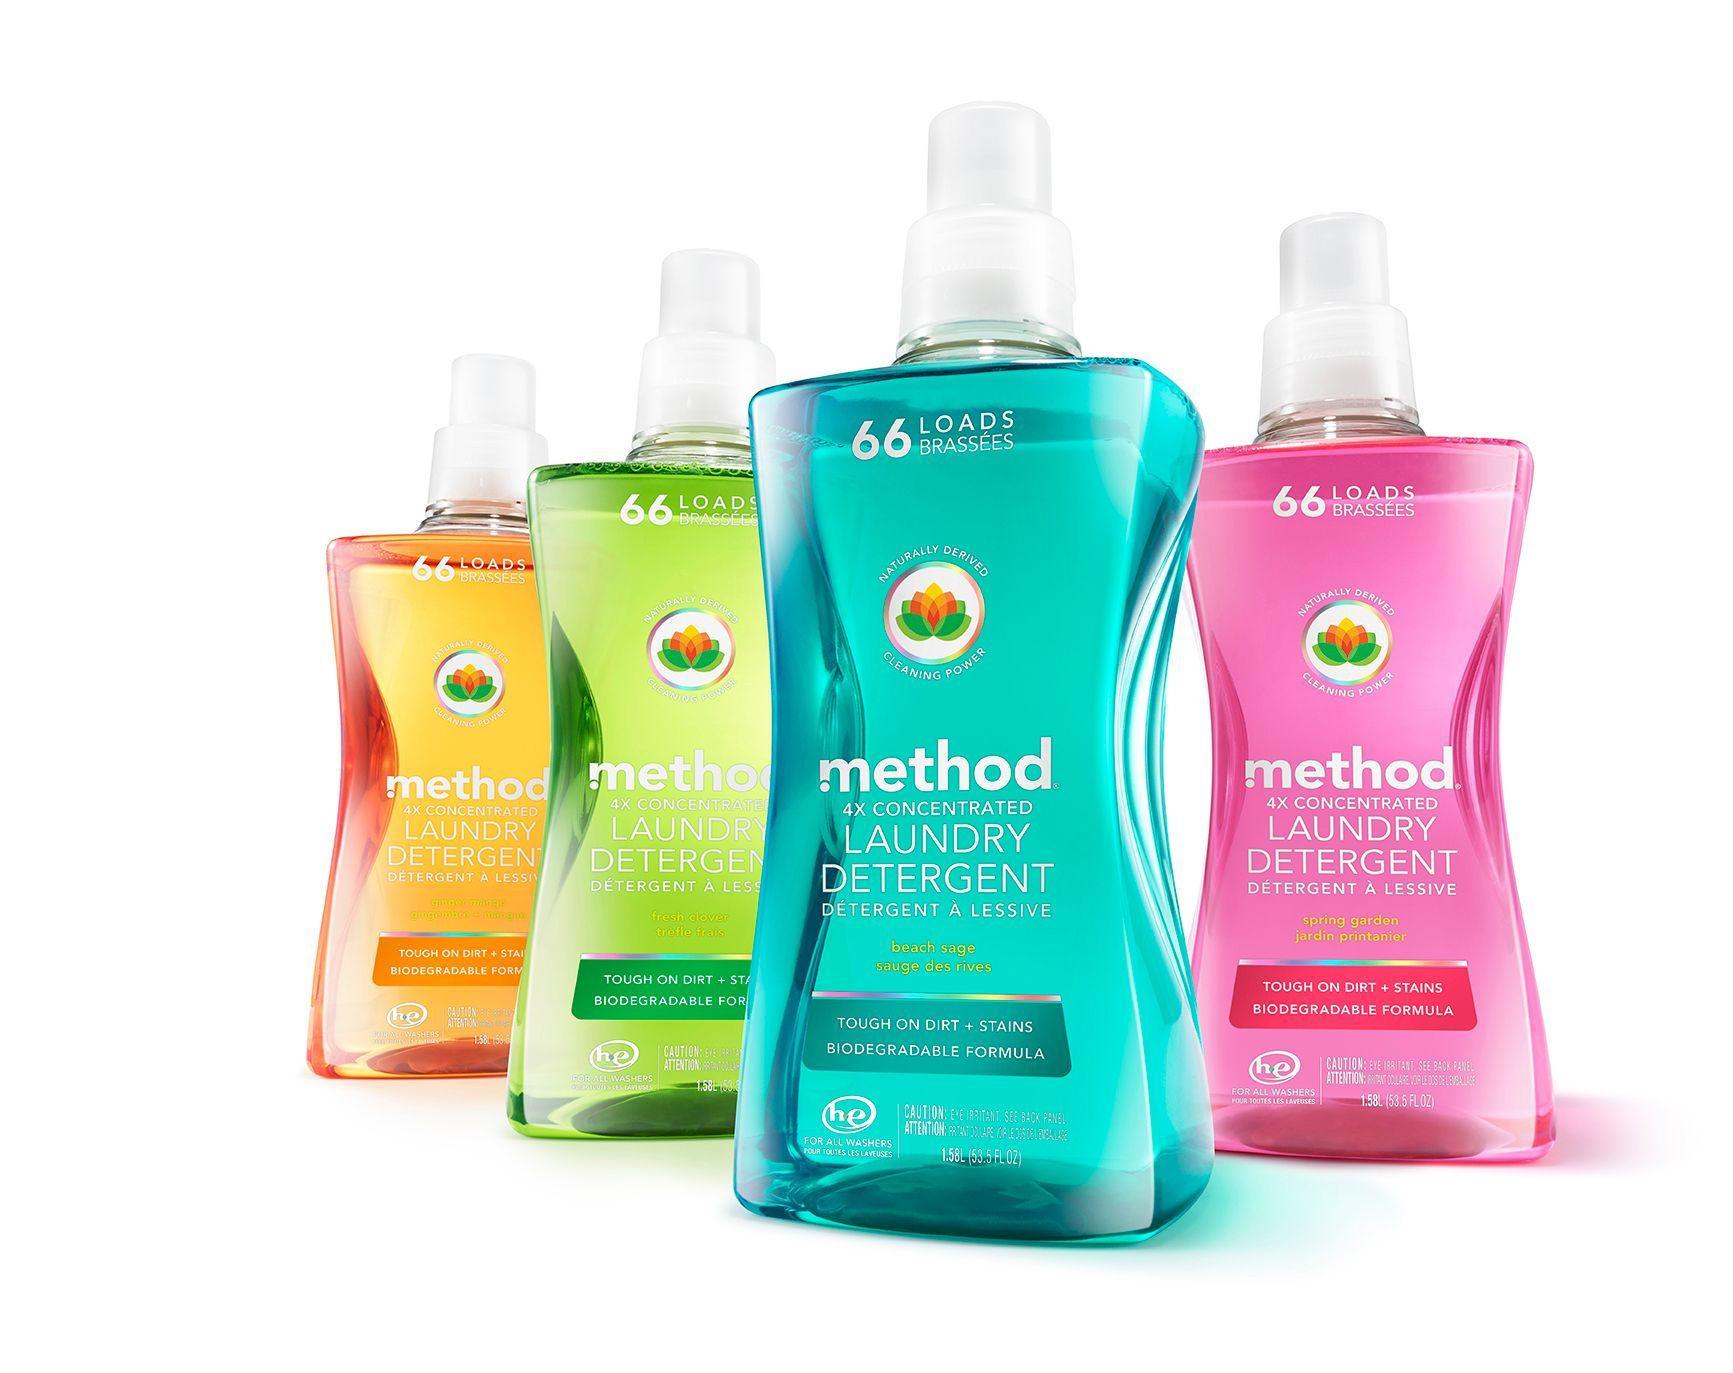 Laundry Detergent Recylced Bottle 2016 Diamond Finalist Award